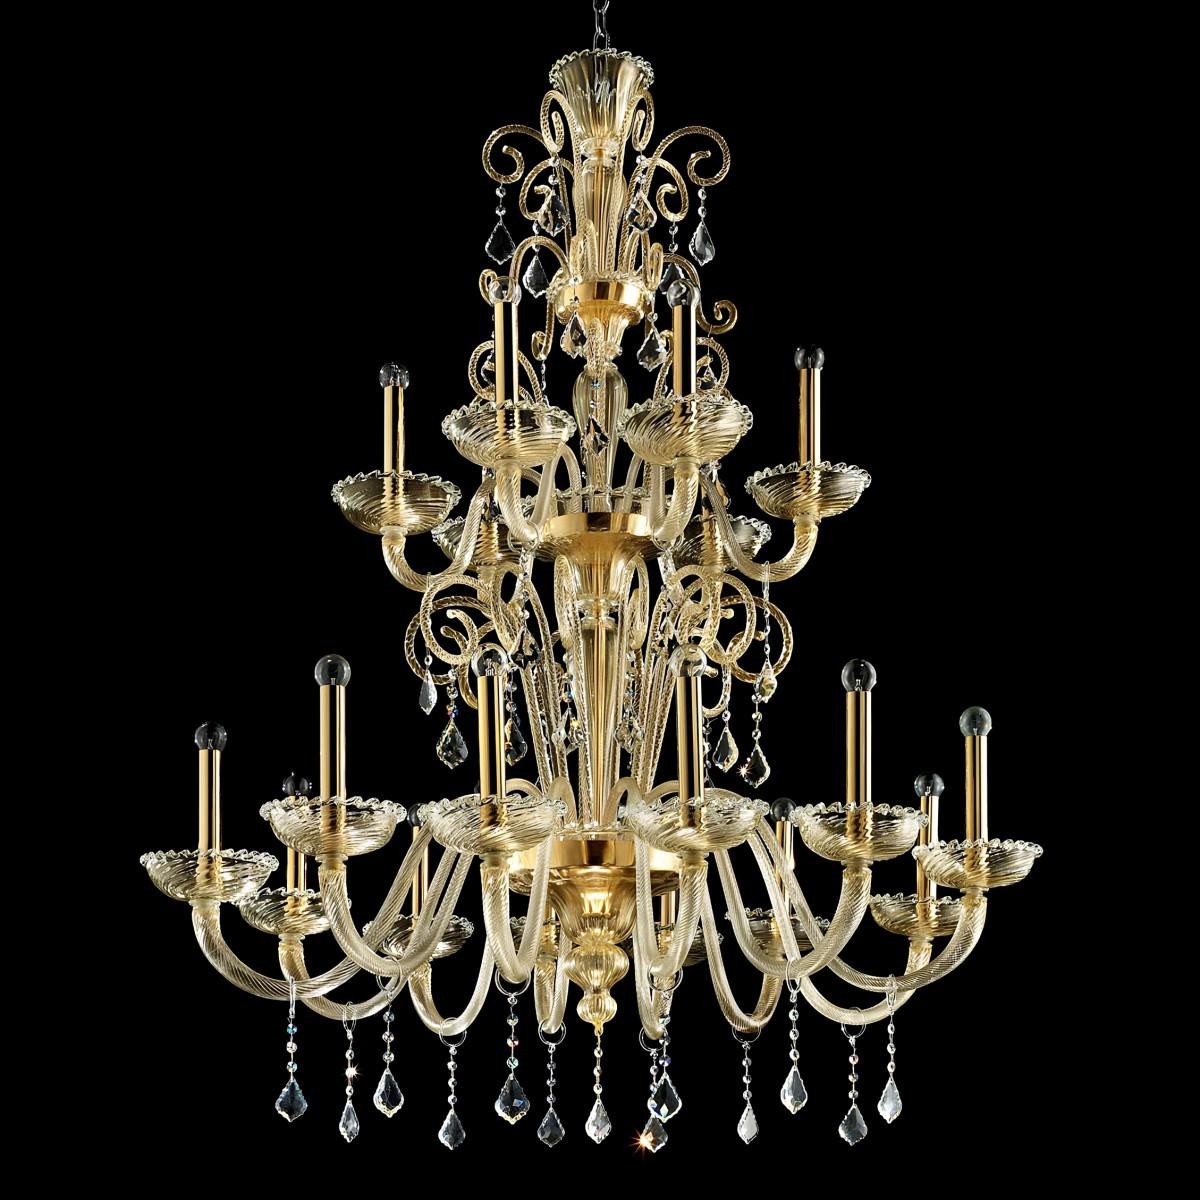 """Re Mida"" Murano glass chandelier - 12+6 lights - all gold"